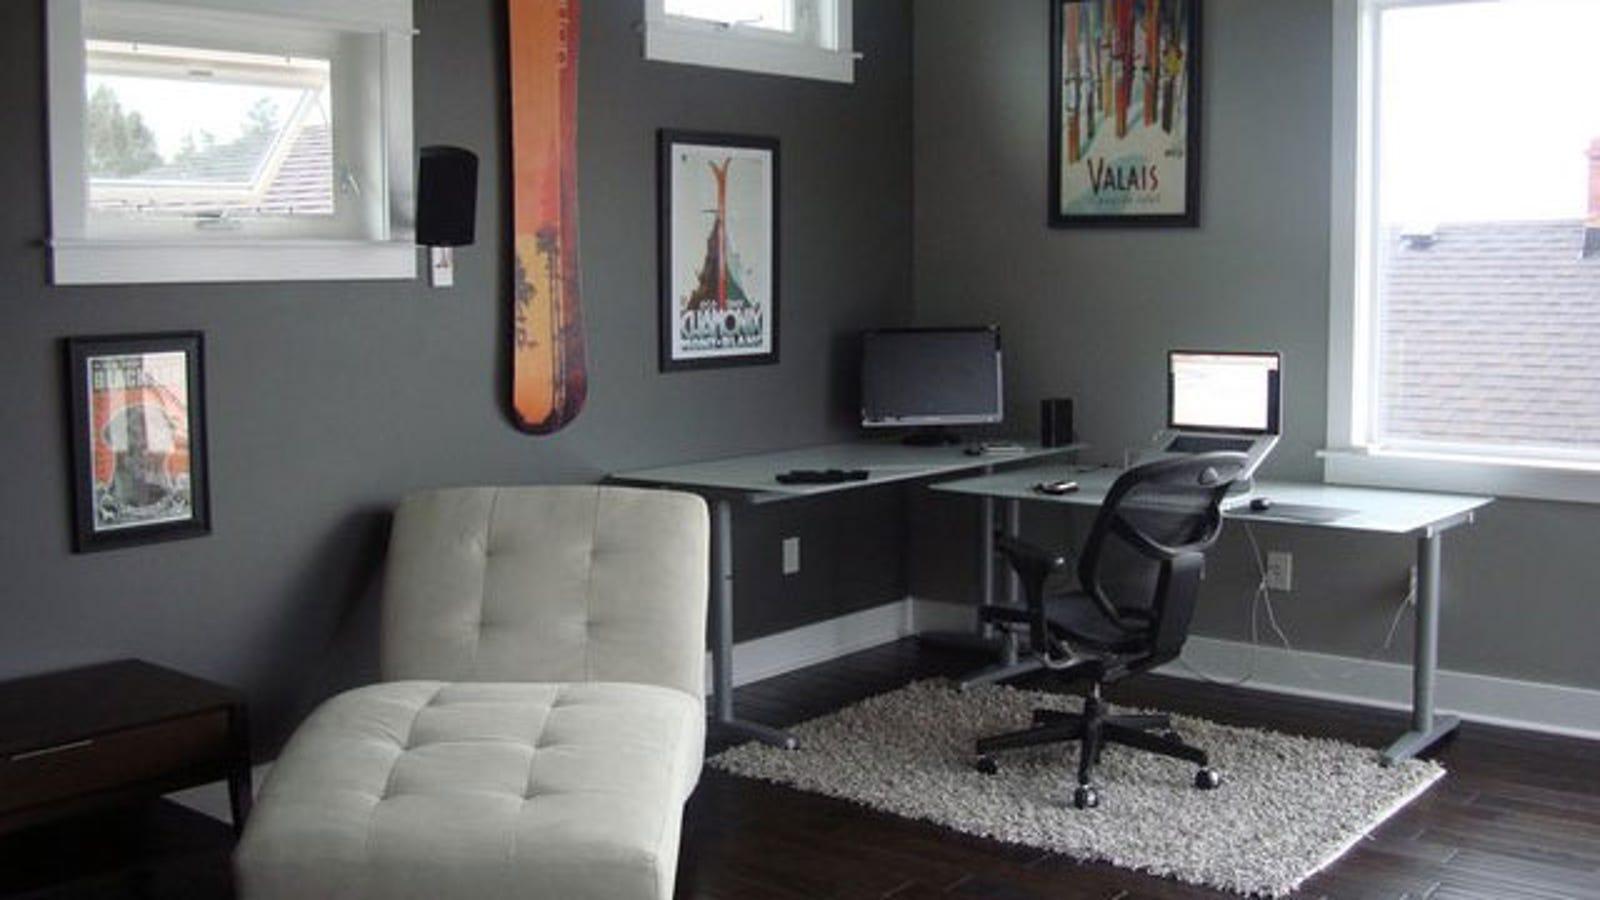 Workspace Furniture Office Interior Corner Office Desk Curved Don Pedro The Quiet Corner Workspace